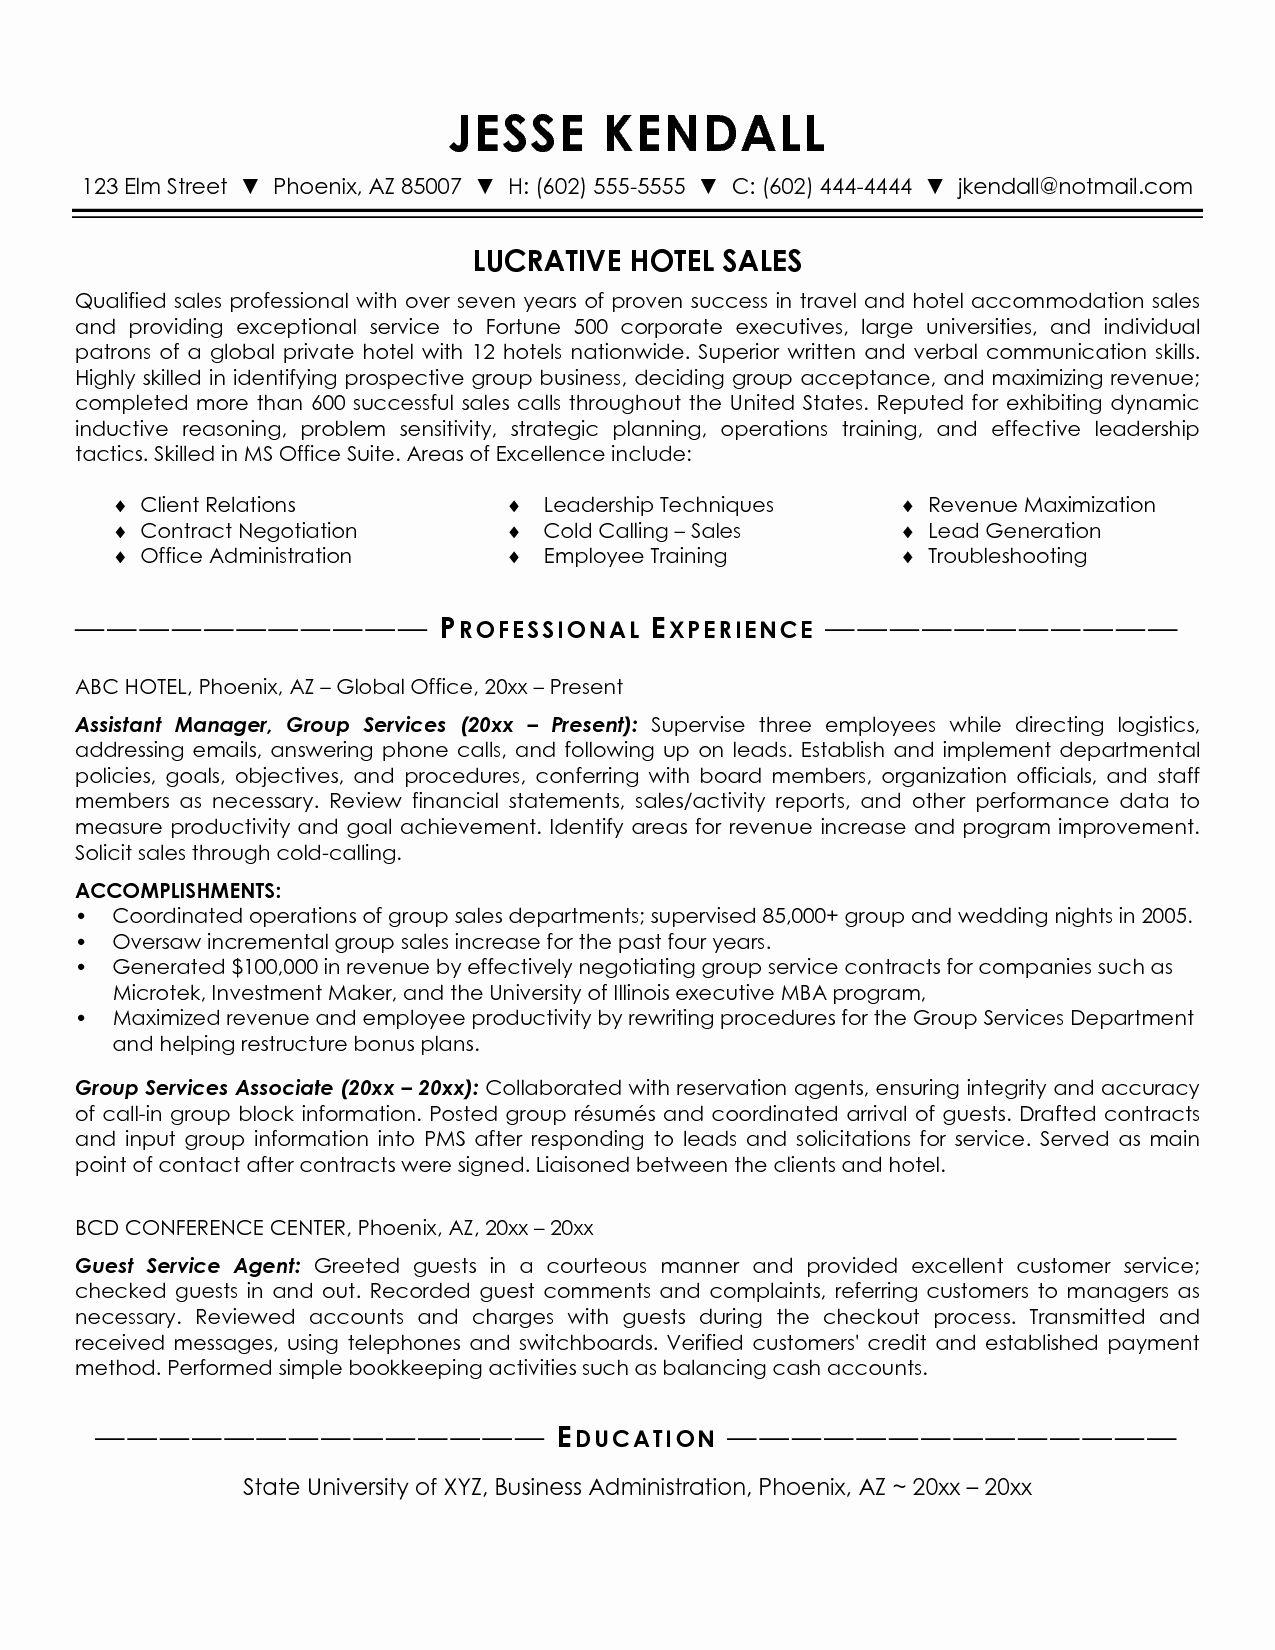 Awesome Hotel Sales Manager Resume Resume Template Ideas Sales Resume Examples Resume Examples Manager Resume